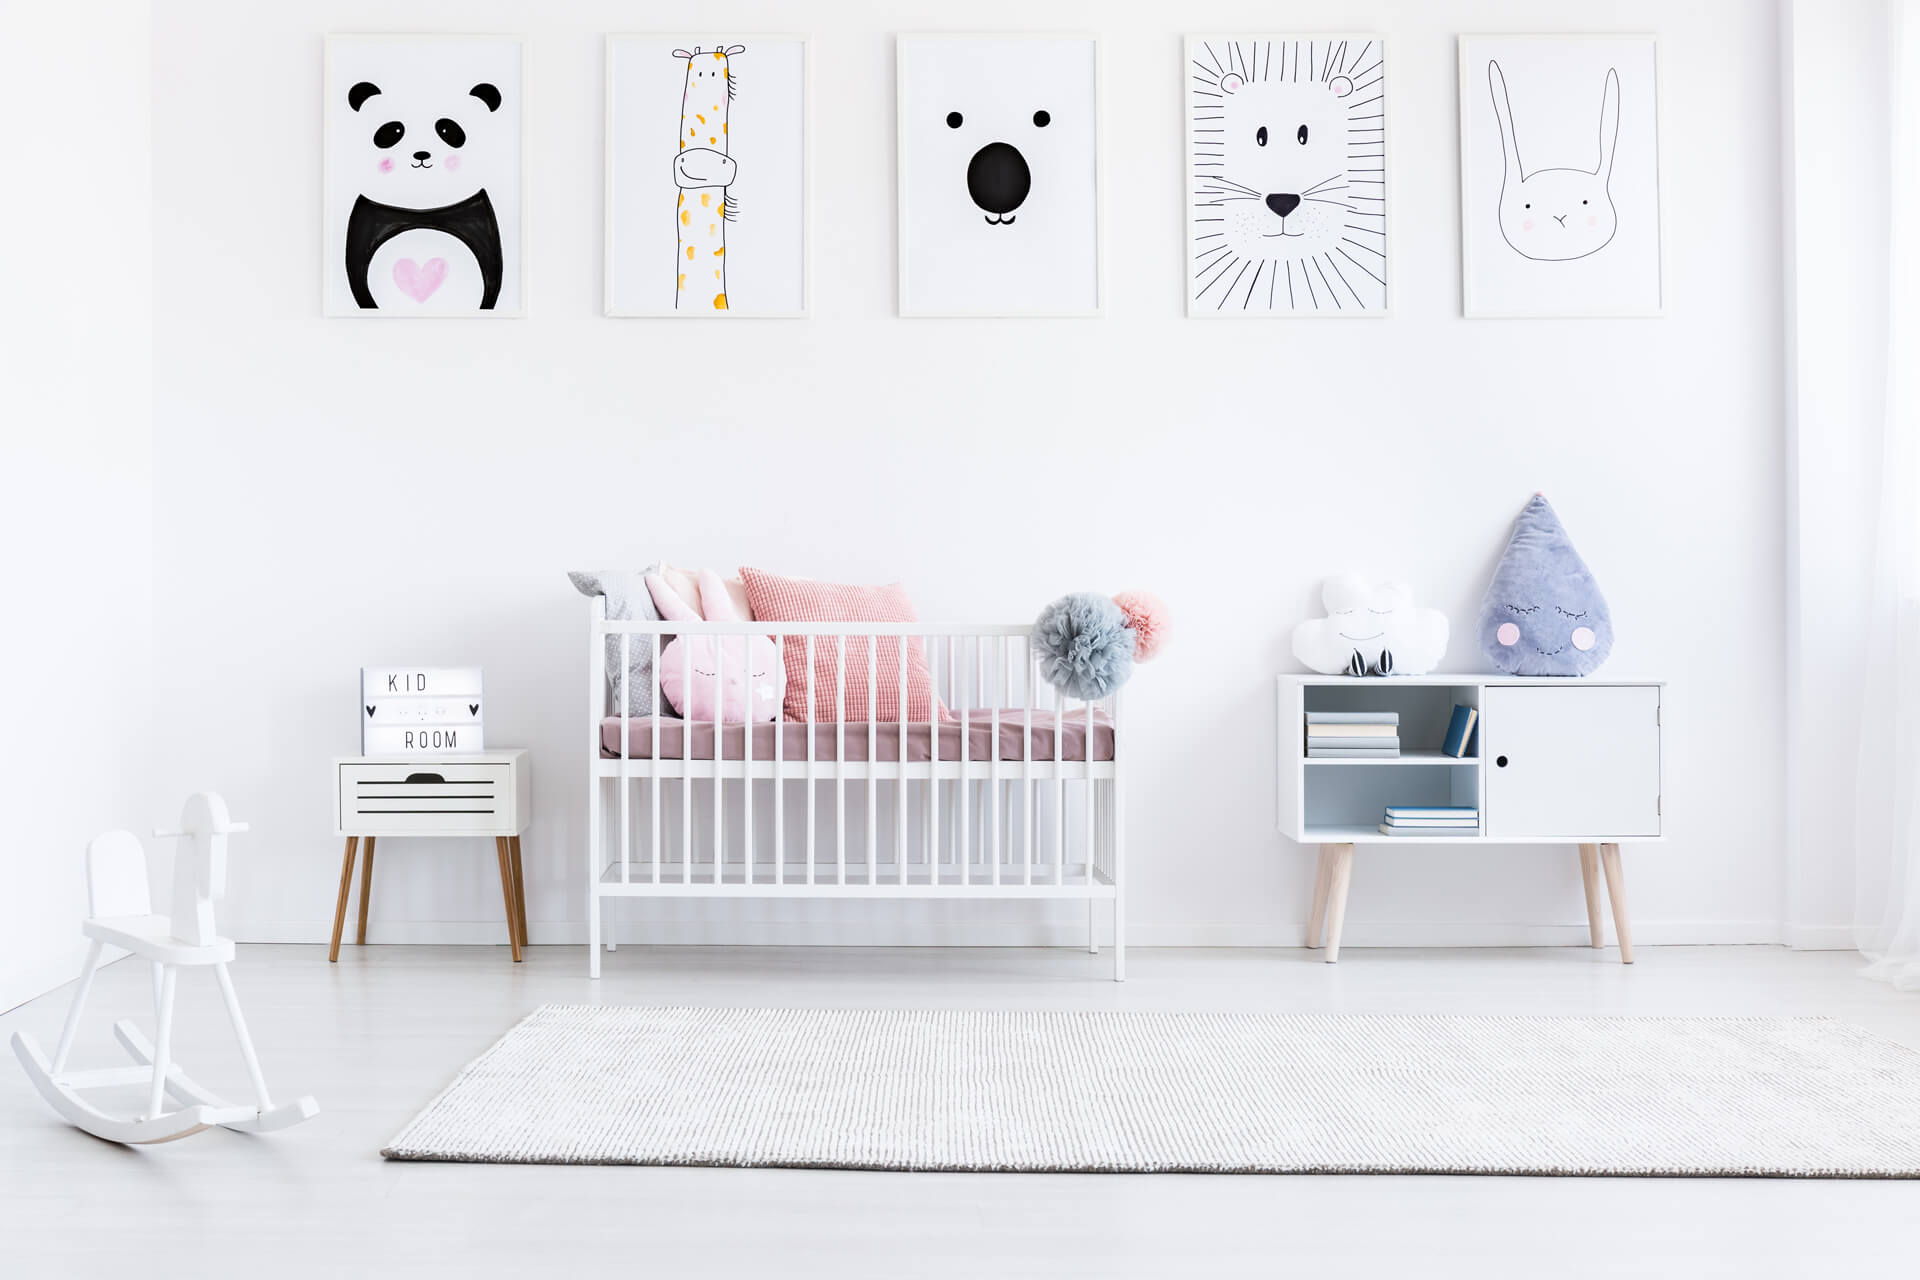 Piezas para bebés con arcoiris